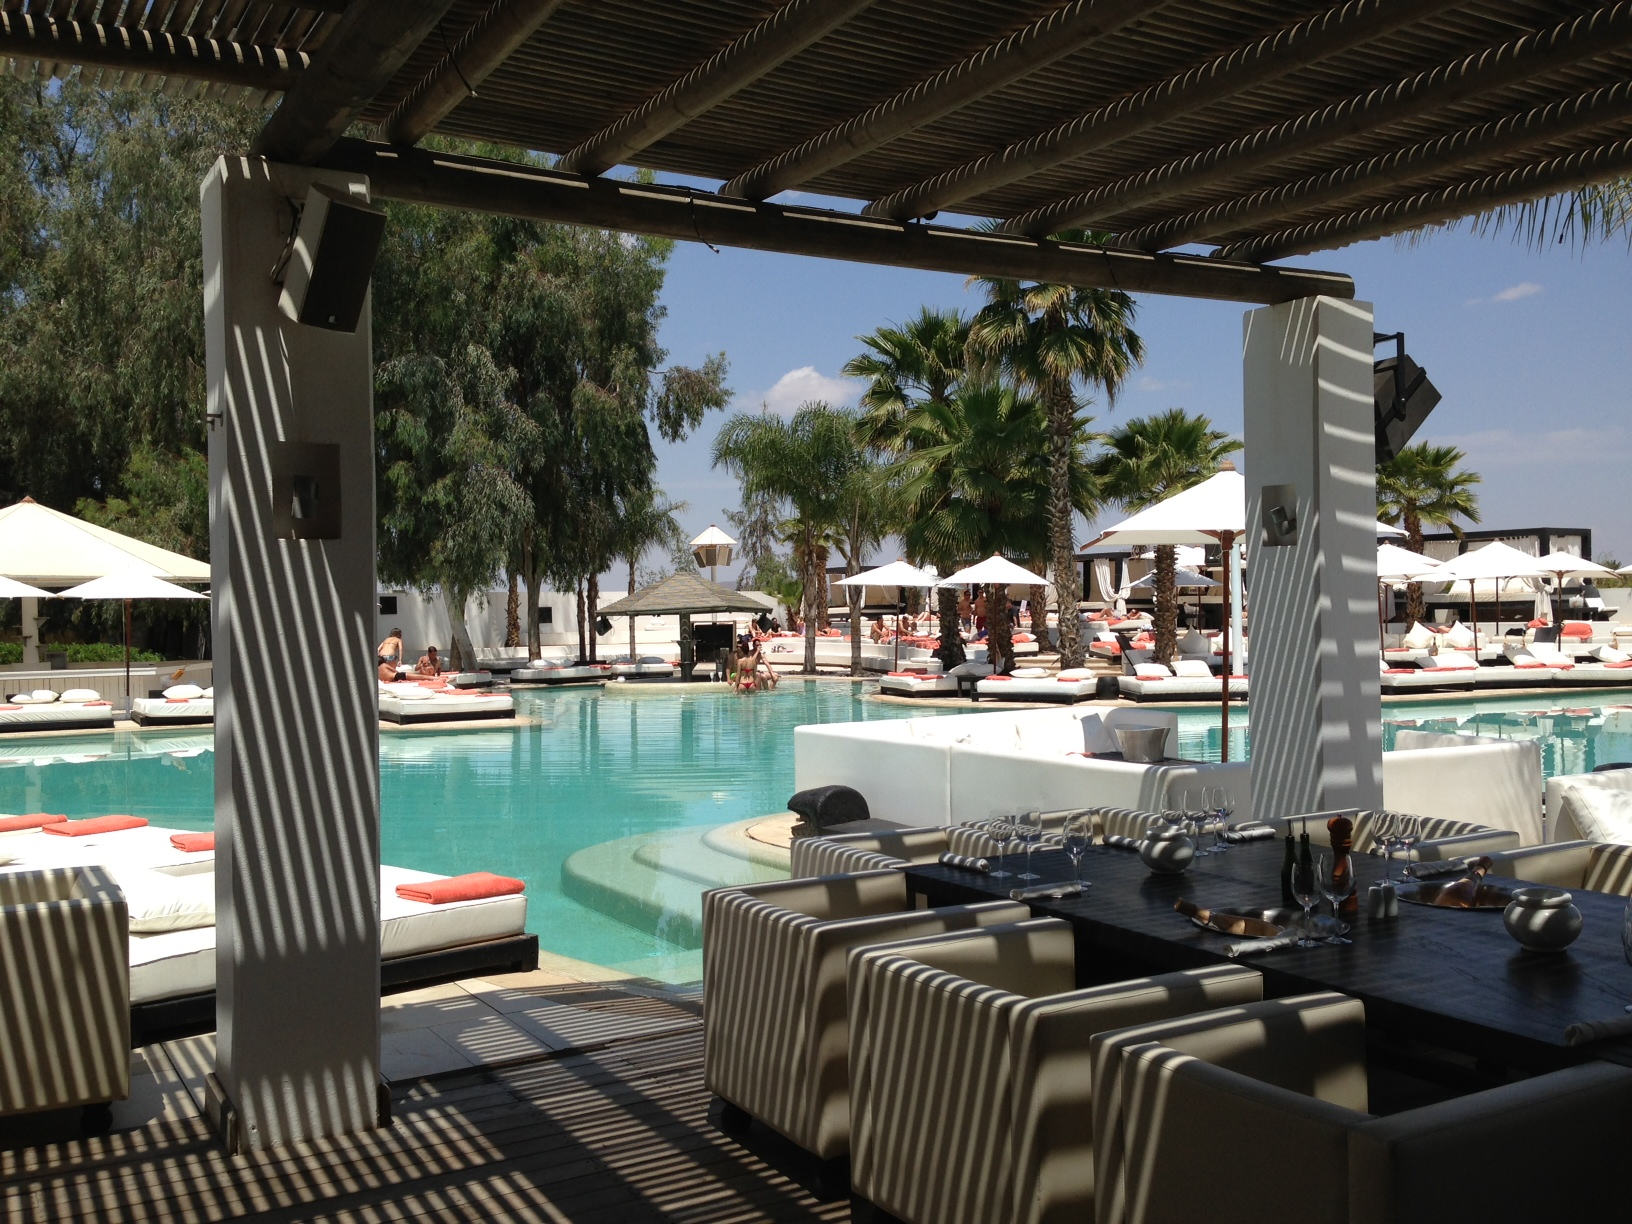 nikki beach marrakech prix tarifs horaire adresse photos vid os avisviaprestige marrakech. Black Bedroom Furniture Sets. Home Design Ideas